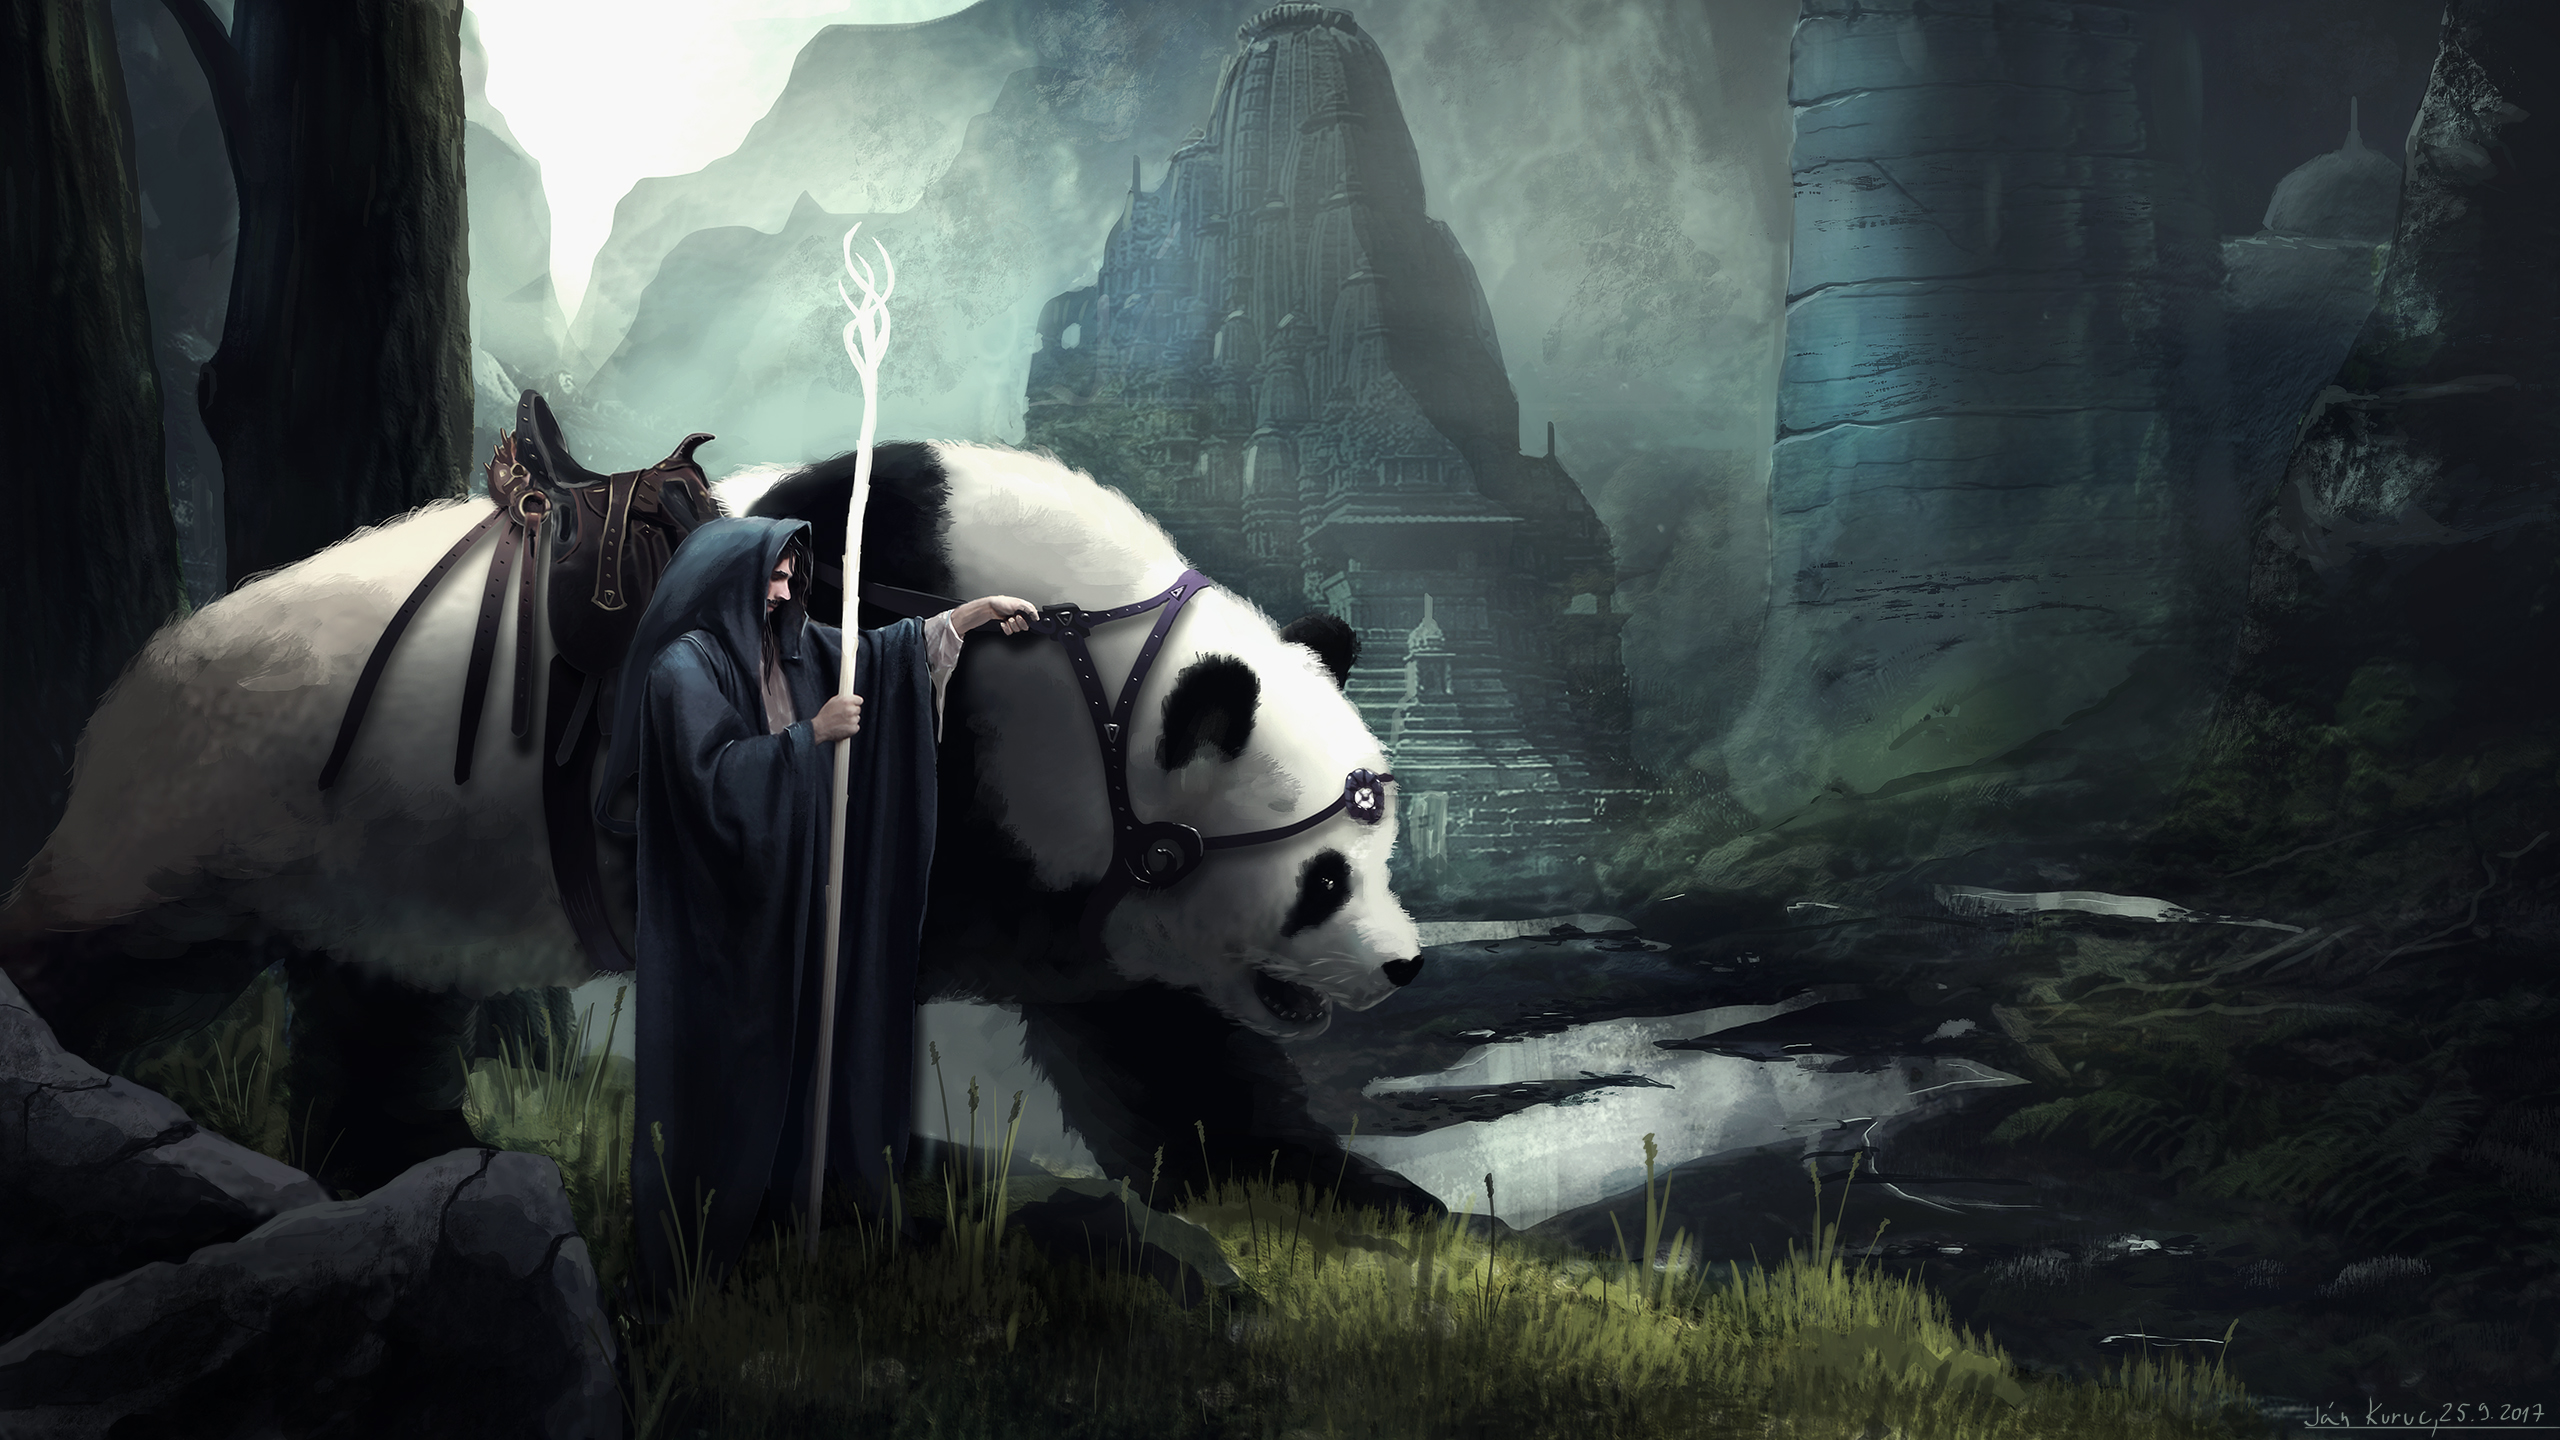 guardian(panda)